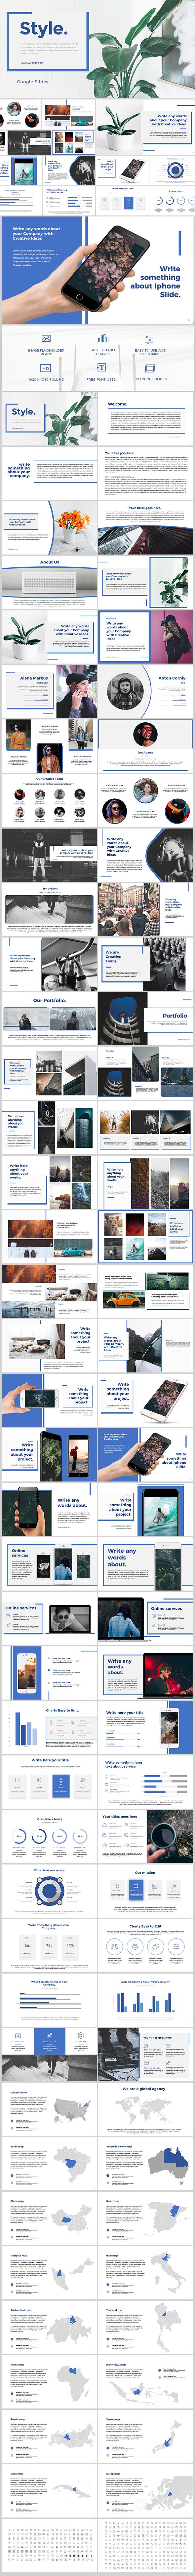 Style Google Slides - Google Slides Presentation Templates